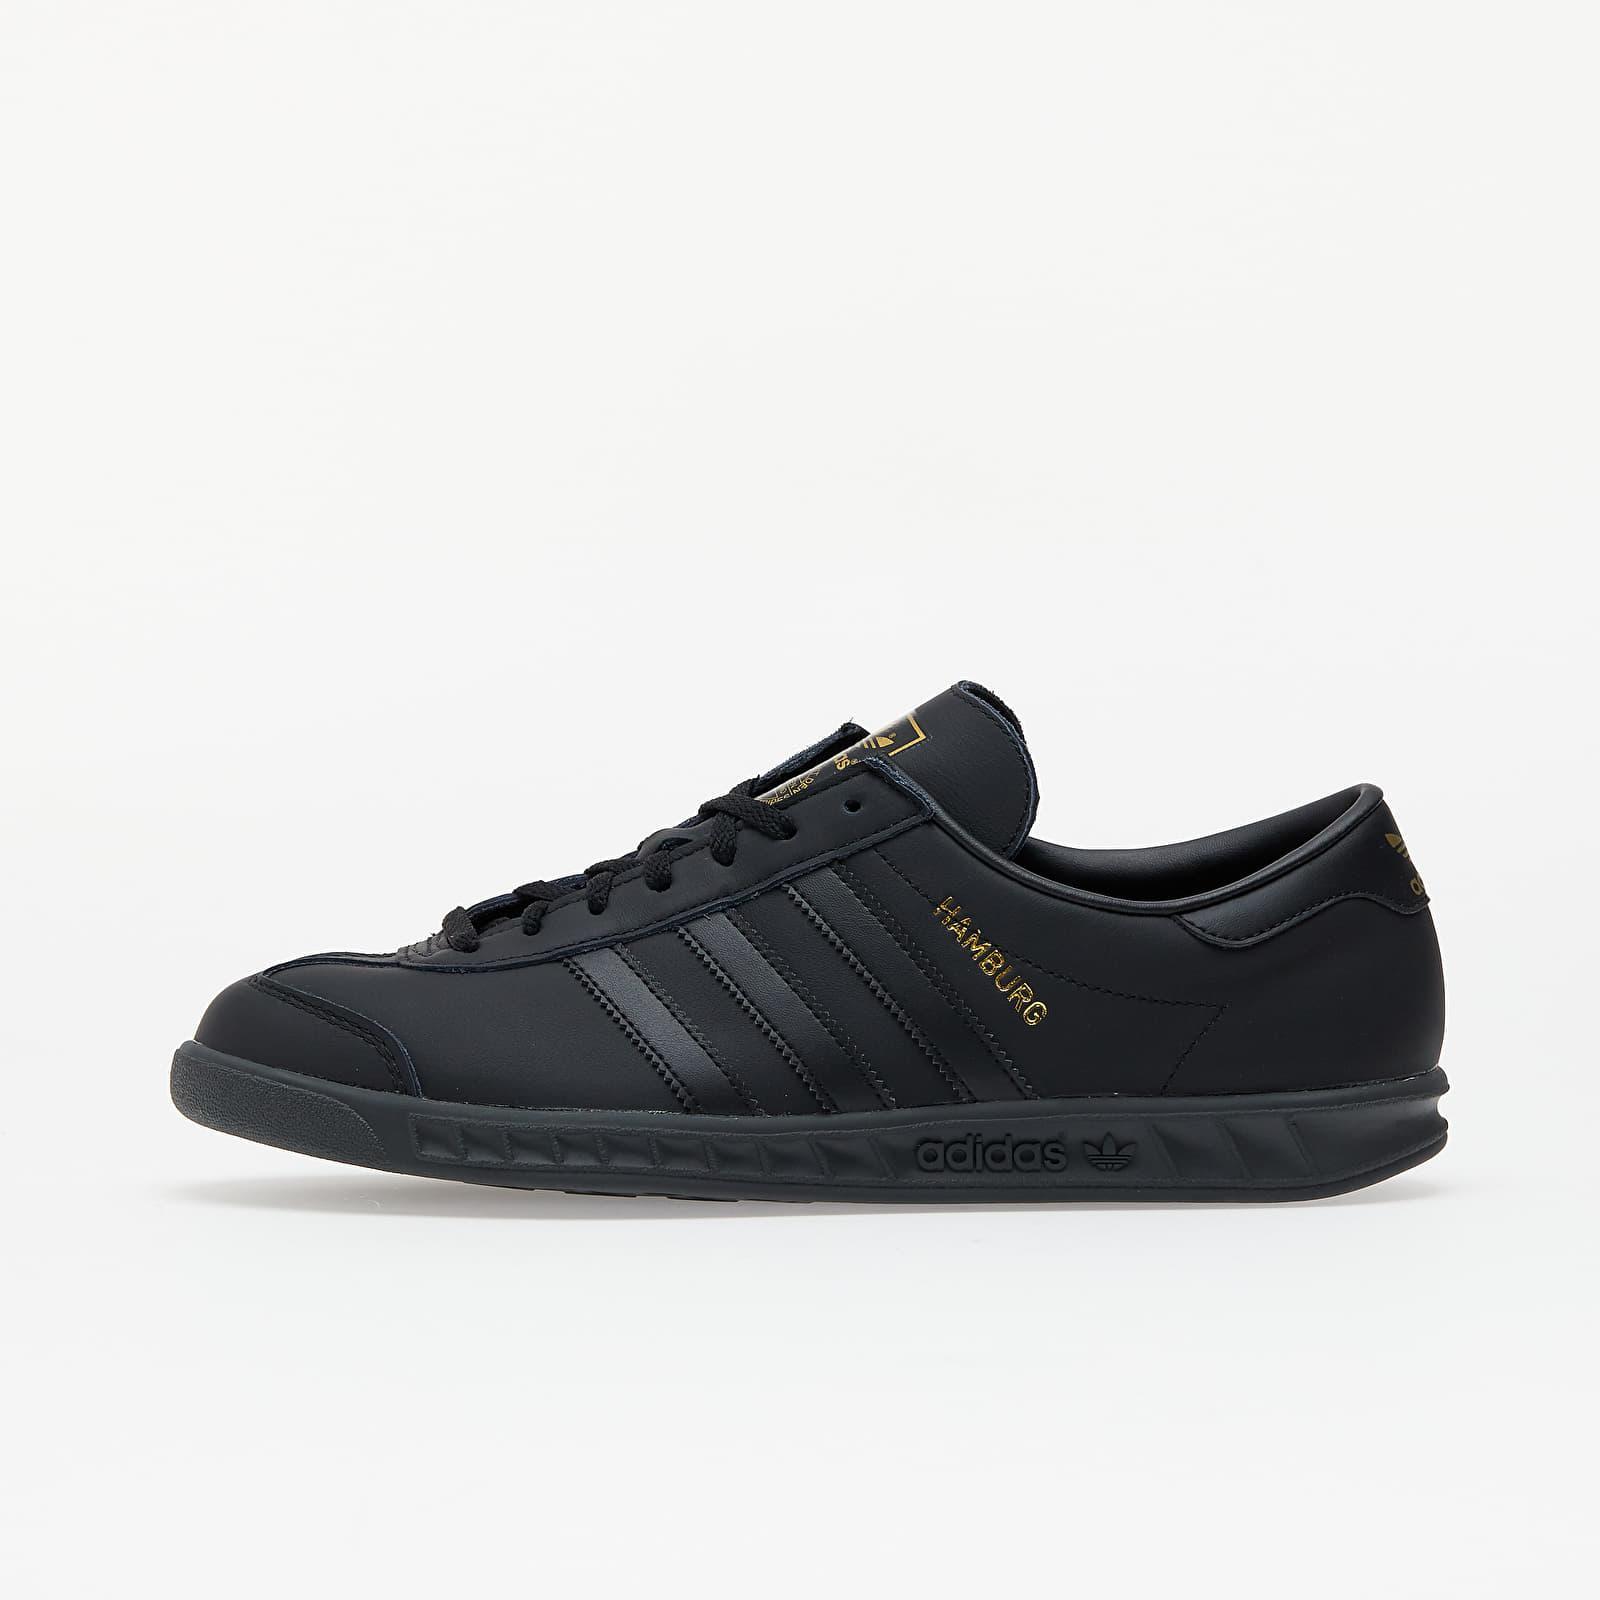 adidas Originals Adidas Hamburg Core Black/ Core Black/ Gold Met ...